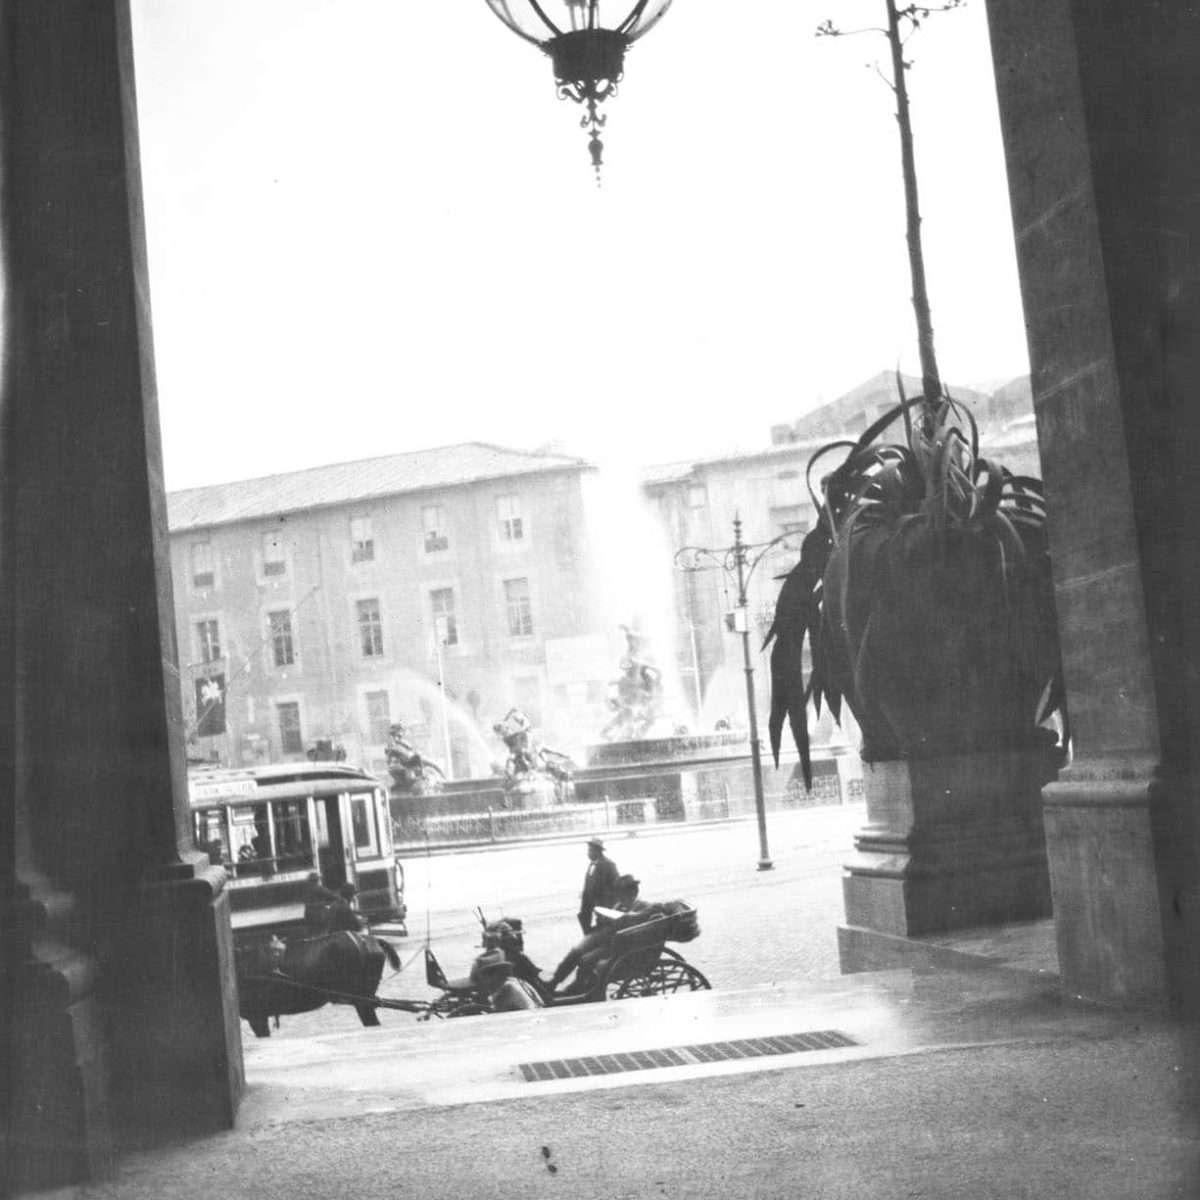 4 - Piazza Esedra